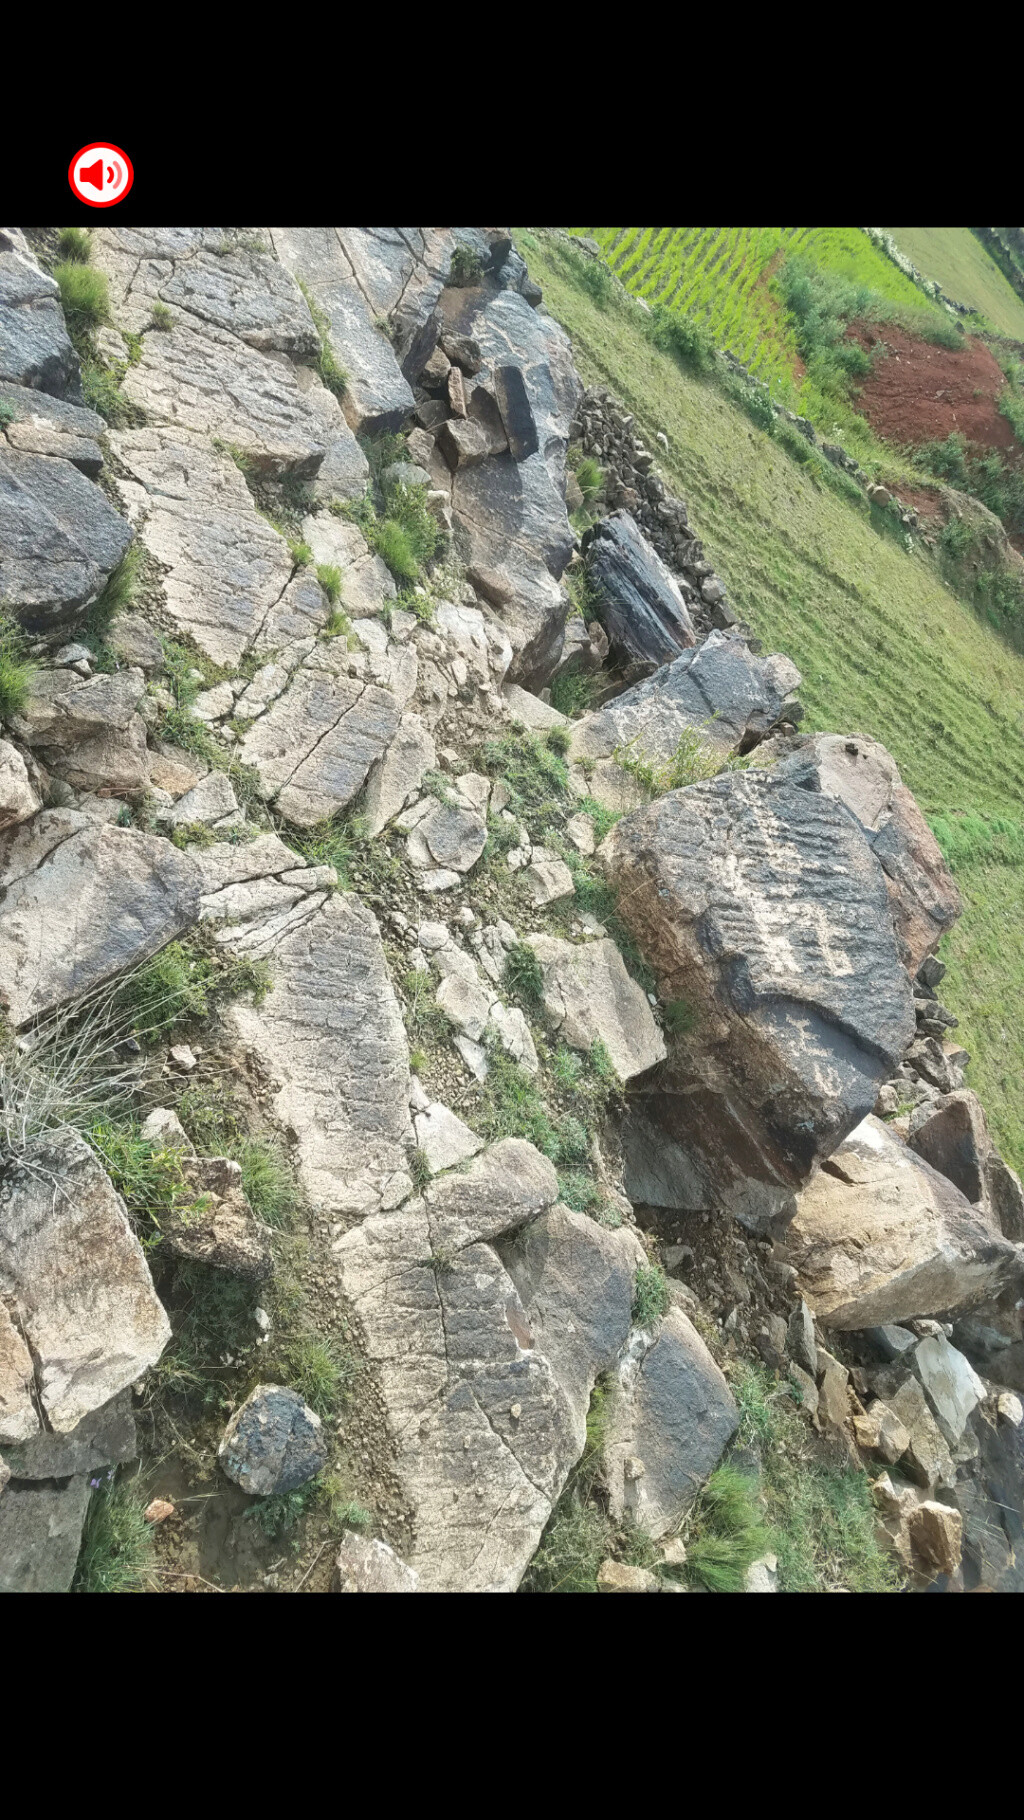 تحليل اشاره وكتابه على صخره  Screen15